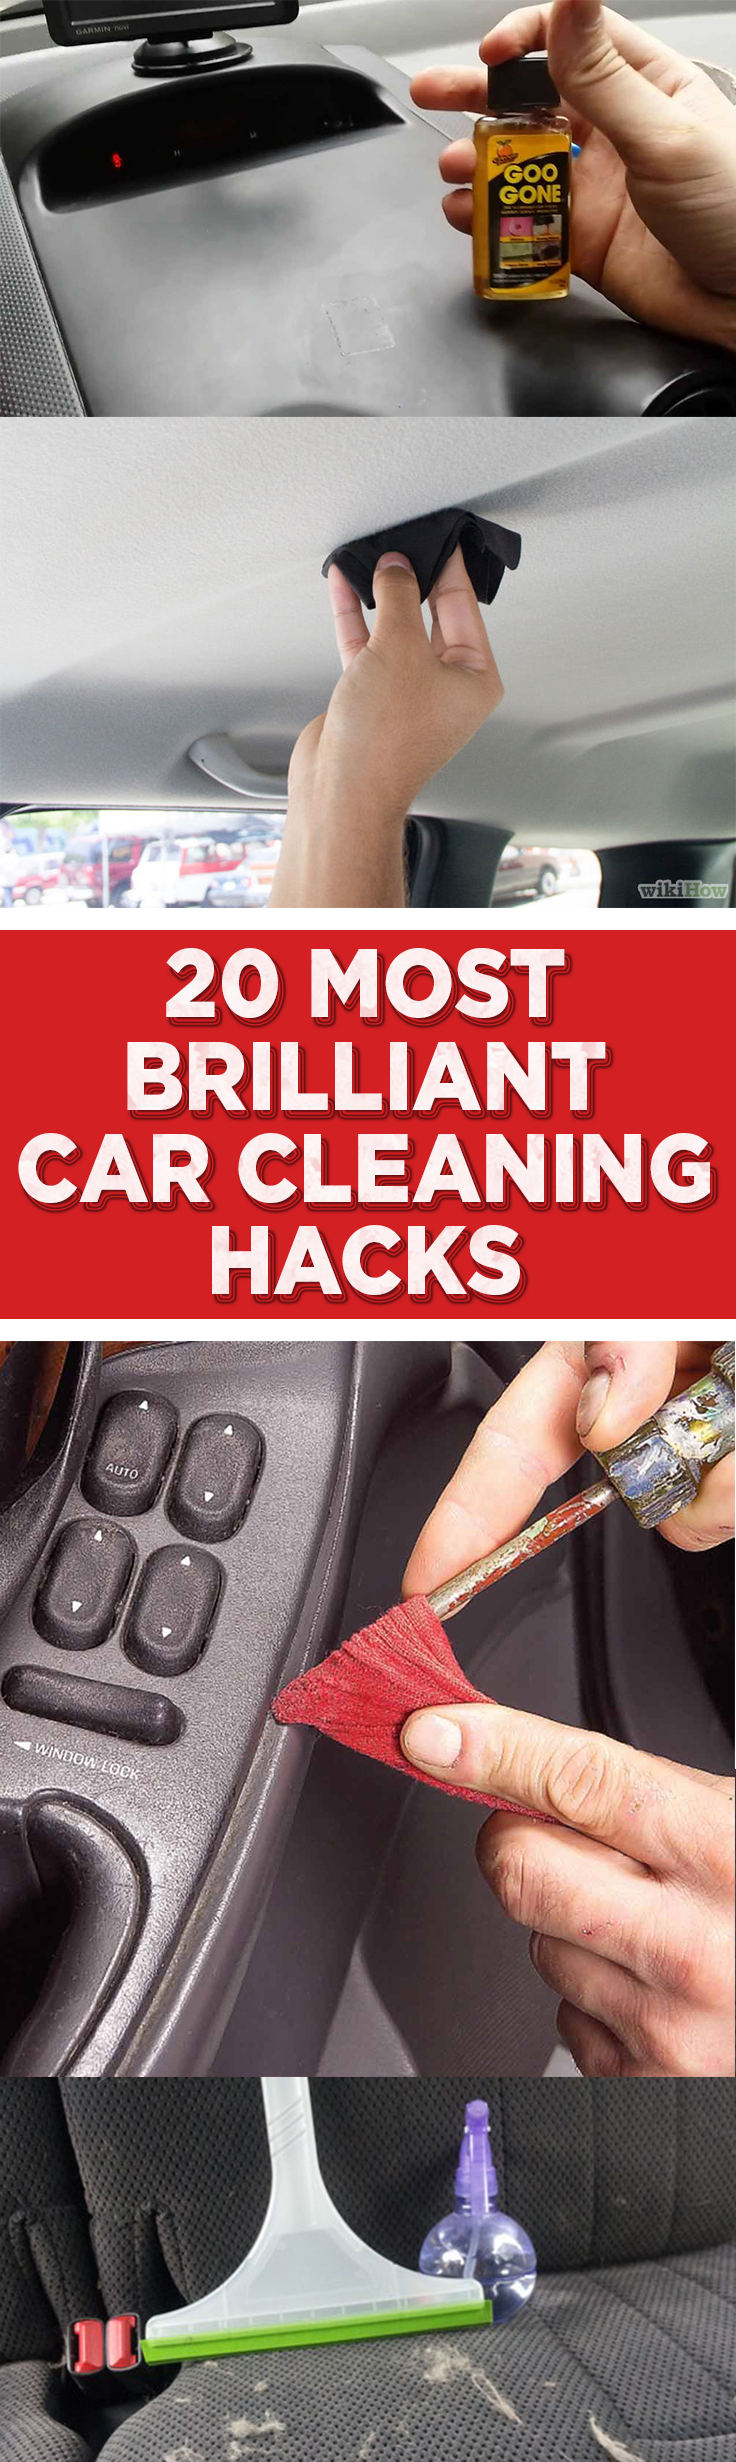 Car cleaning hacks, clean car, car hacks, car detailing, popular pin, car organization, DIY car cleaning. #Cleaning #CleanCar #CleanCarTips #CarOrganization #ClutterFreeCar